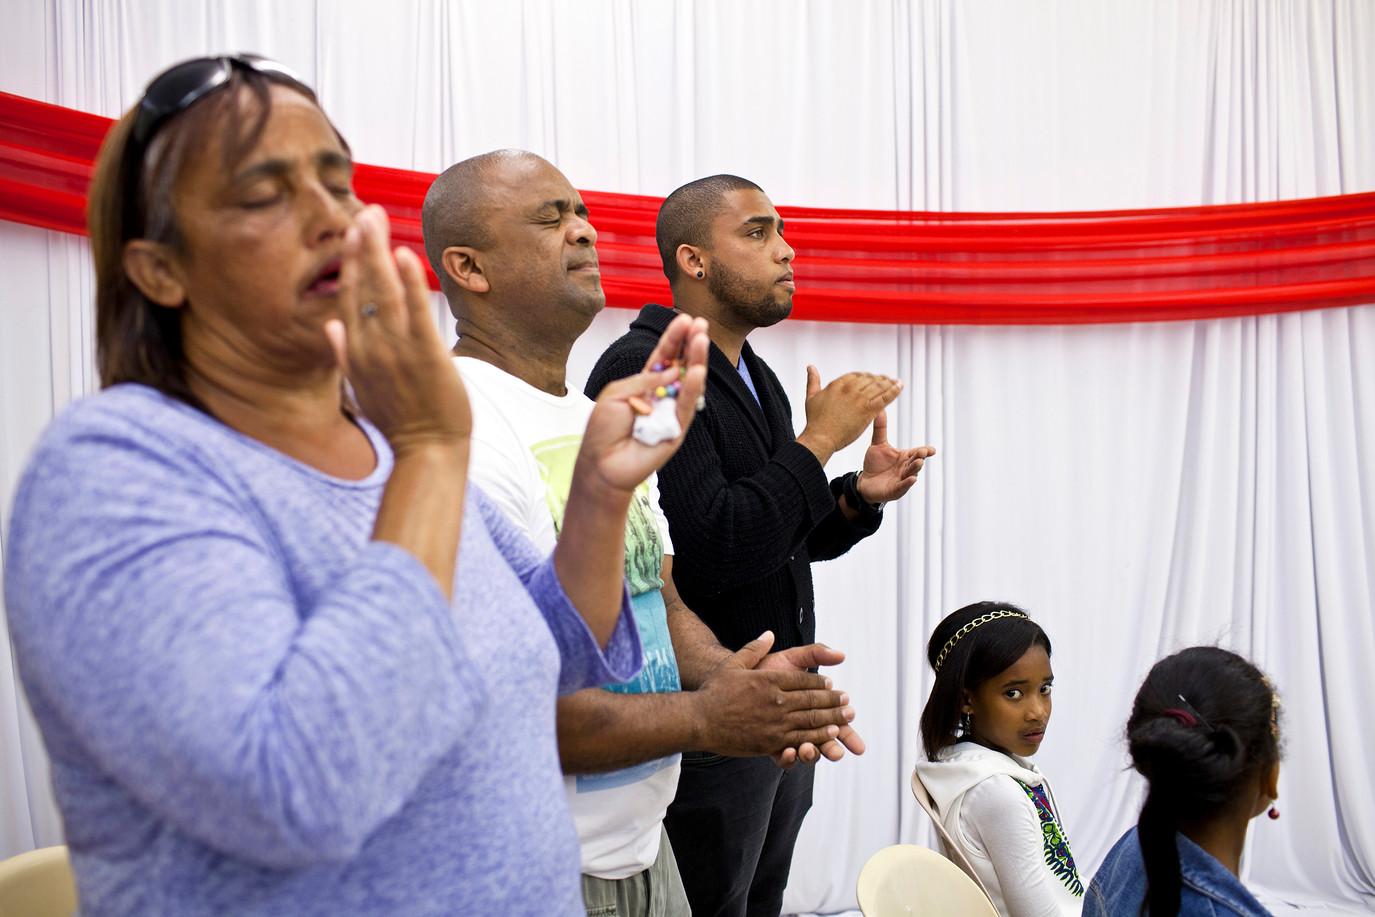 NGO_CSR-RLABS-South Africa 006.jpg